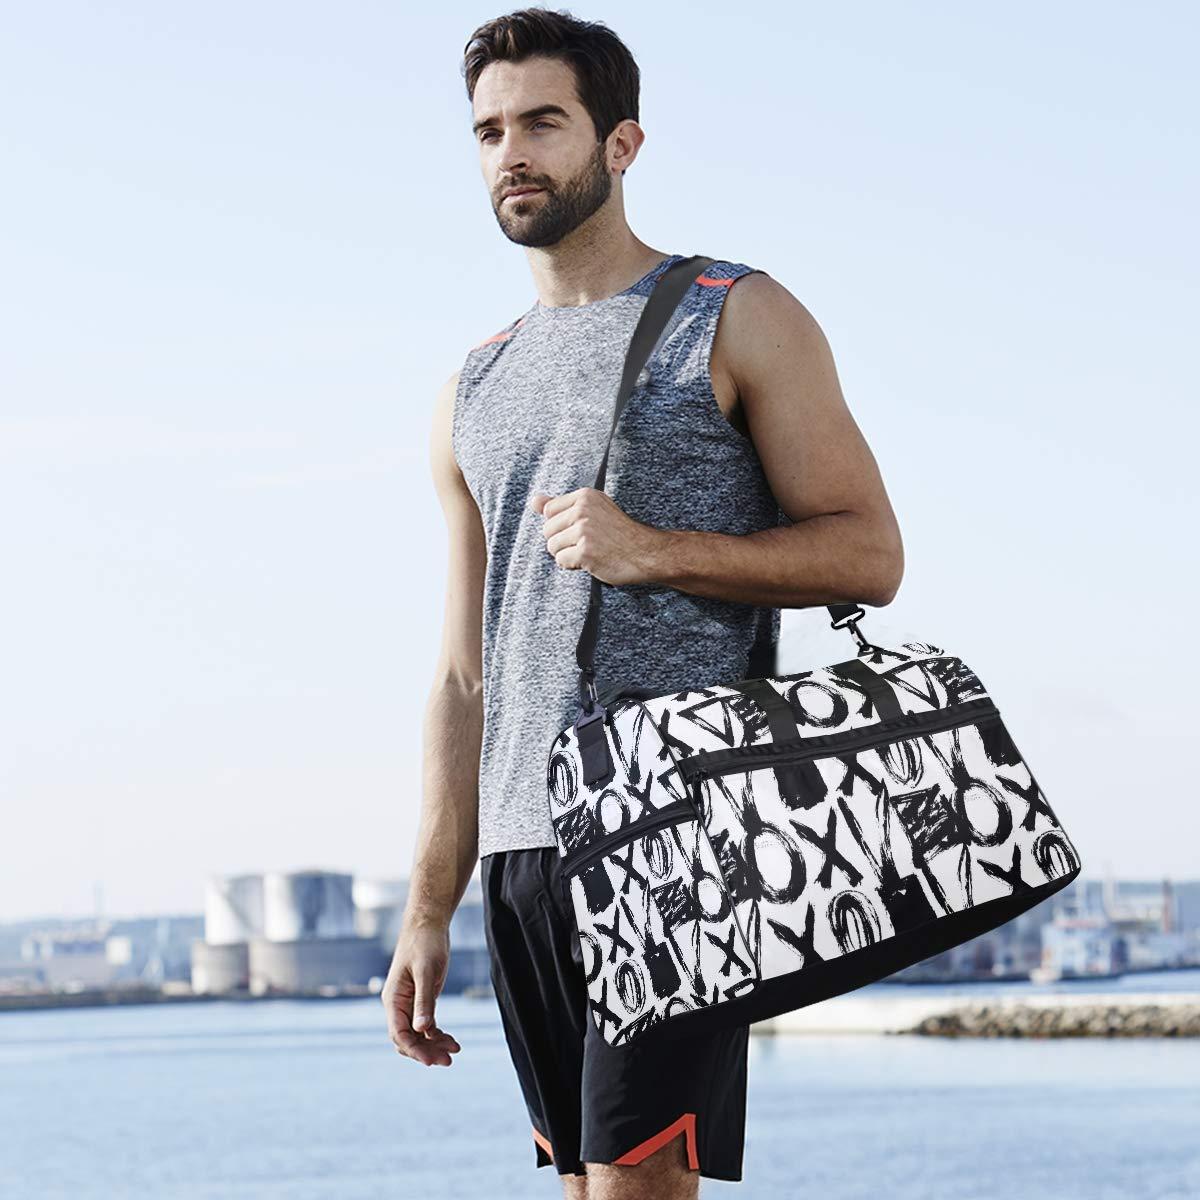 Mathematical Algorithm Geometric Large Travel Duffel Bag For Women Men Overnight Weekend Lightweight Luggage Bag